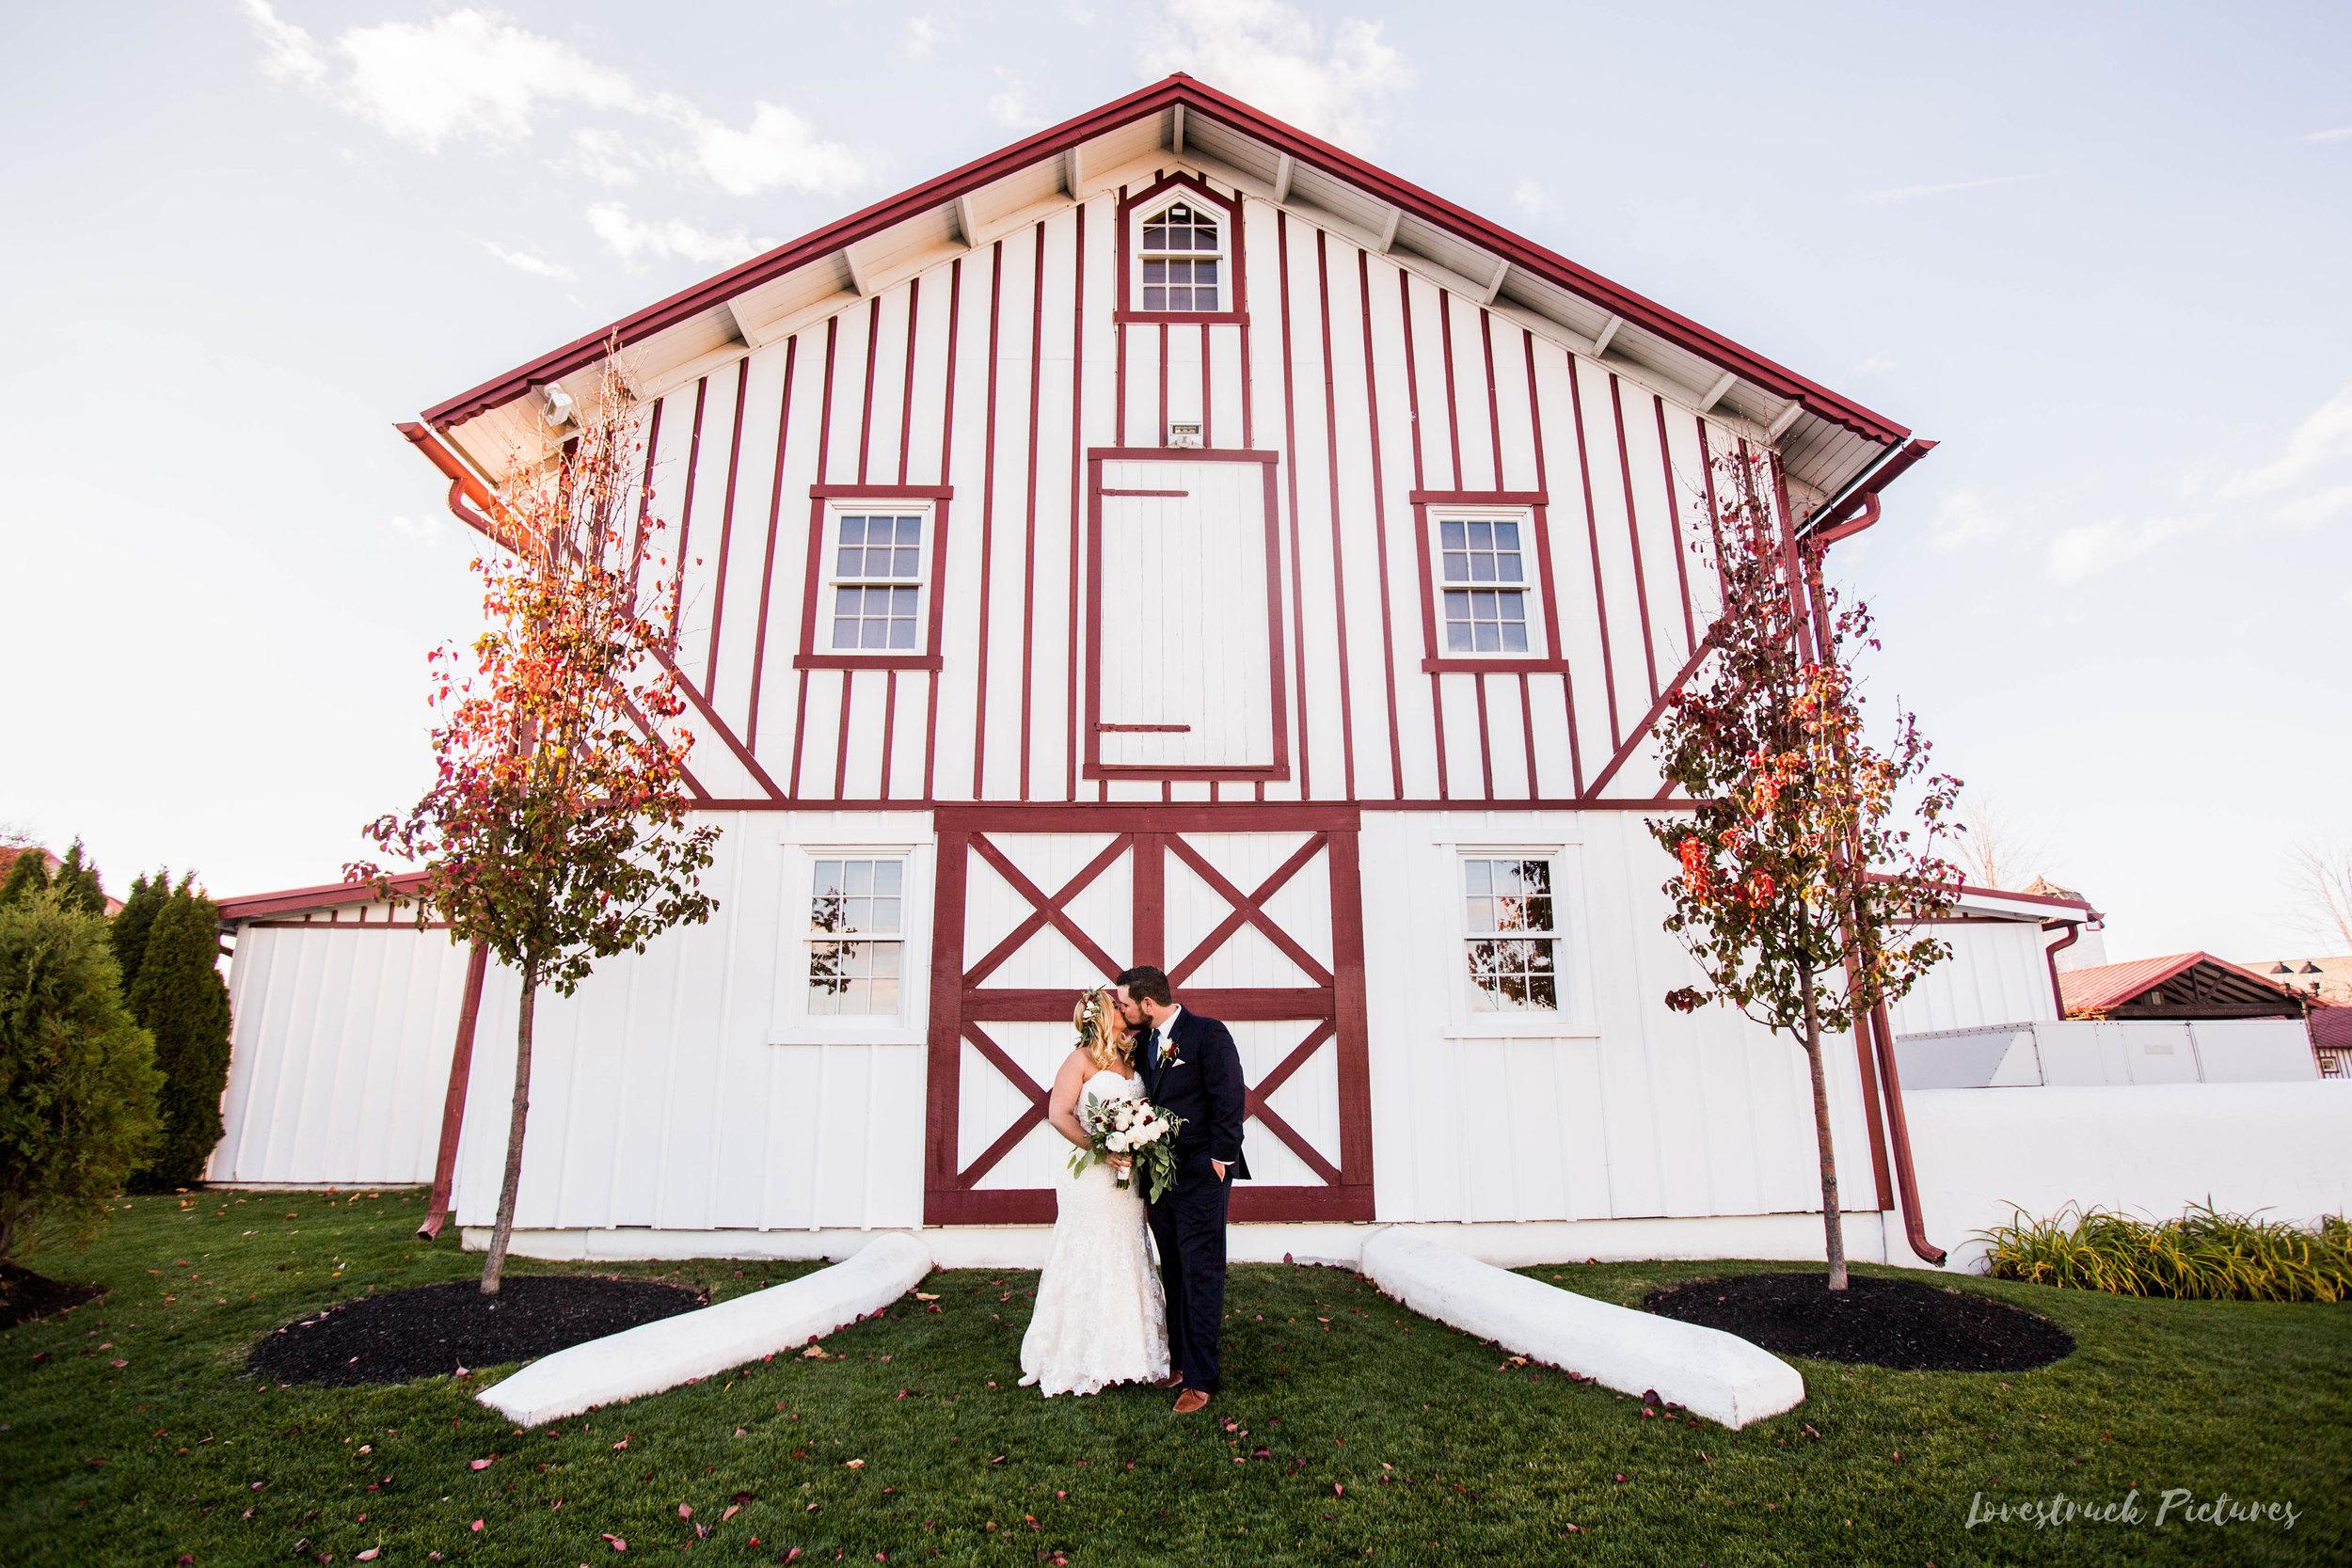 NORMANDY_FARMS_WEDDING_BLUEBELL_PA--35.jpg